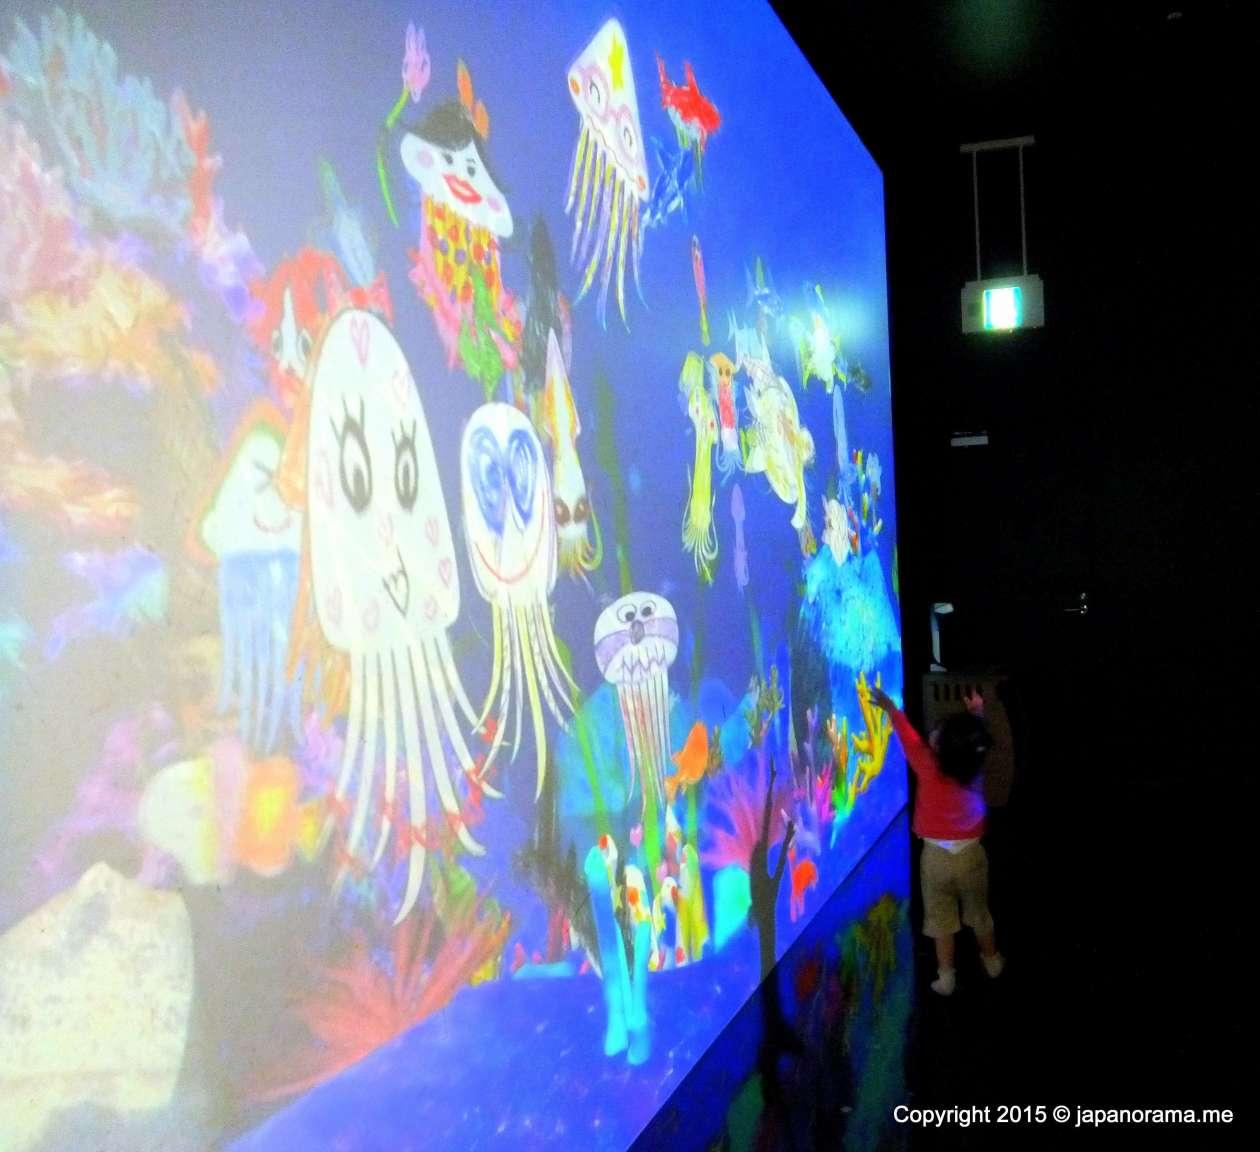 Sketch Aquarium Teamlab Islands, Team Lab Kids, team lab Lalaport